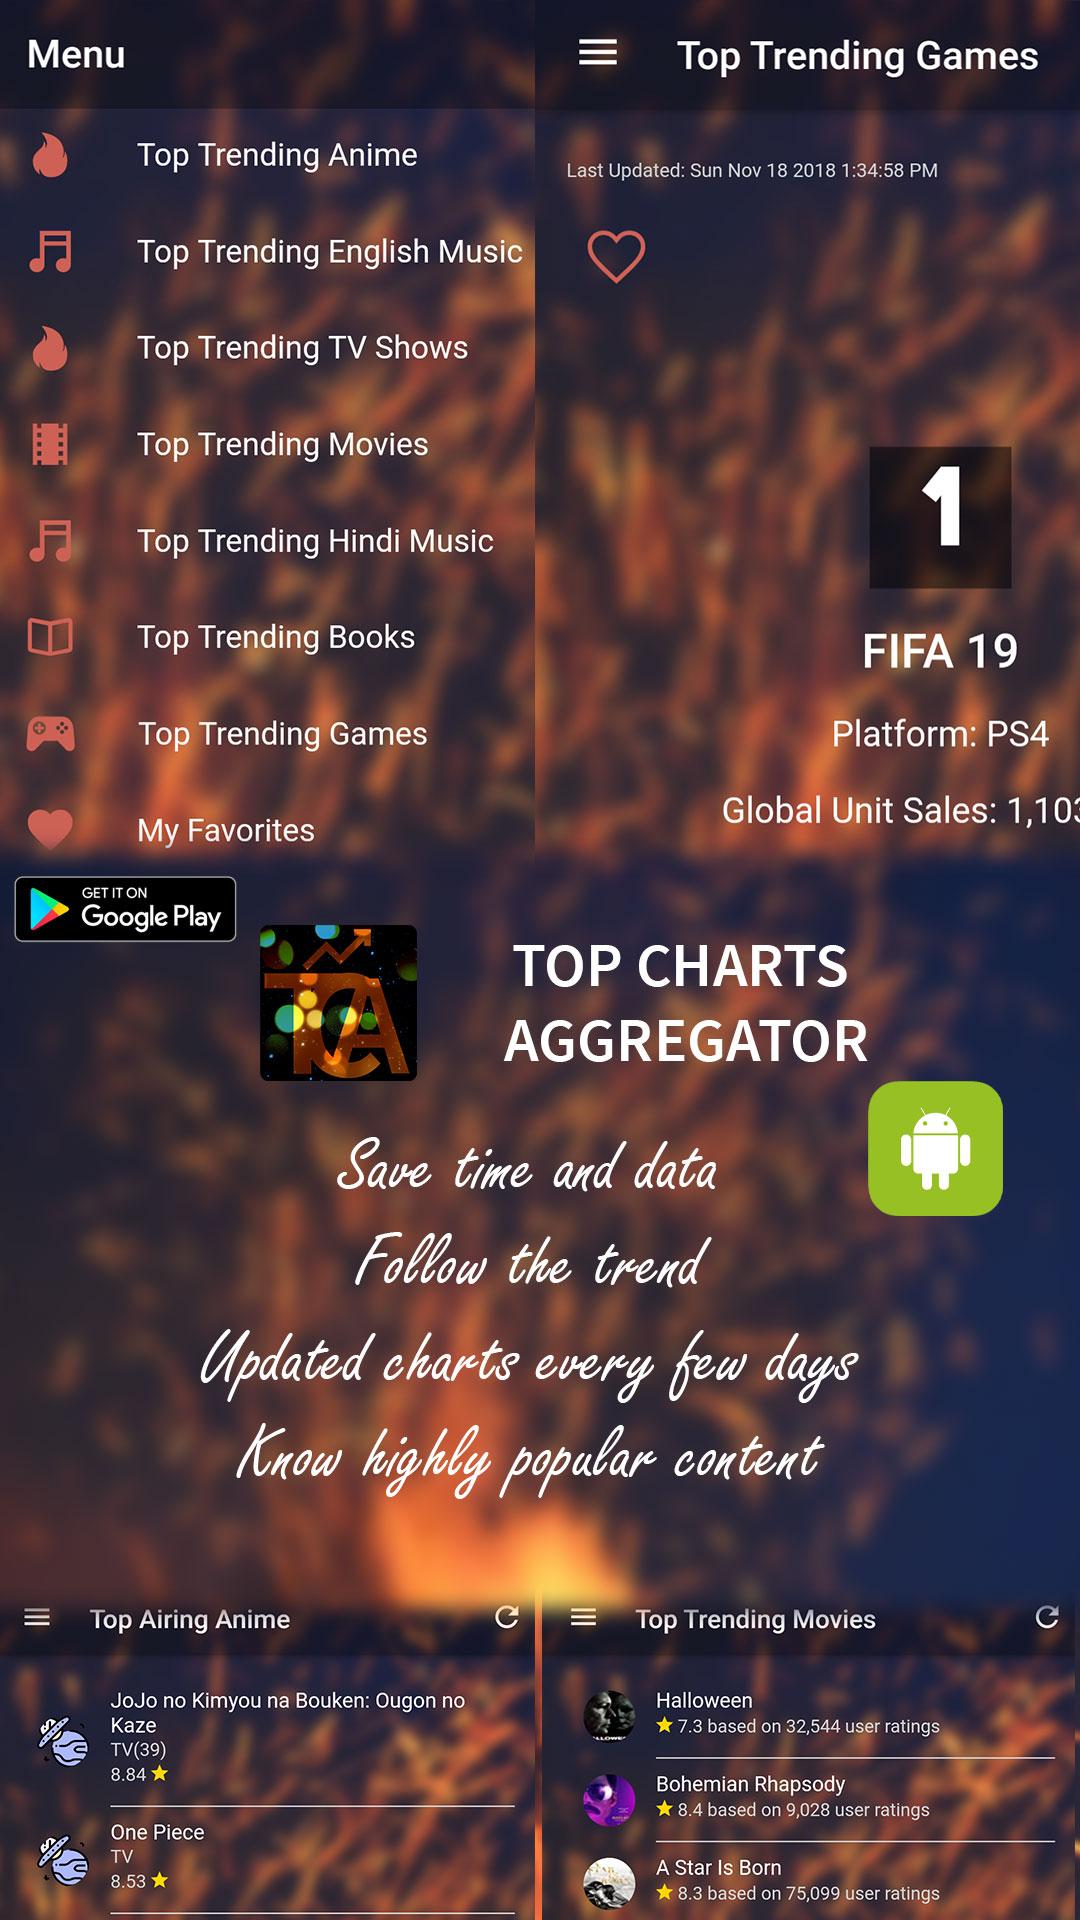 https://play.google.com/store/apps/details?id=com.pratikkataria.topchartsaggregator